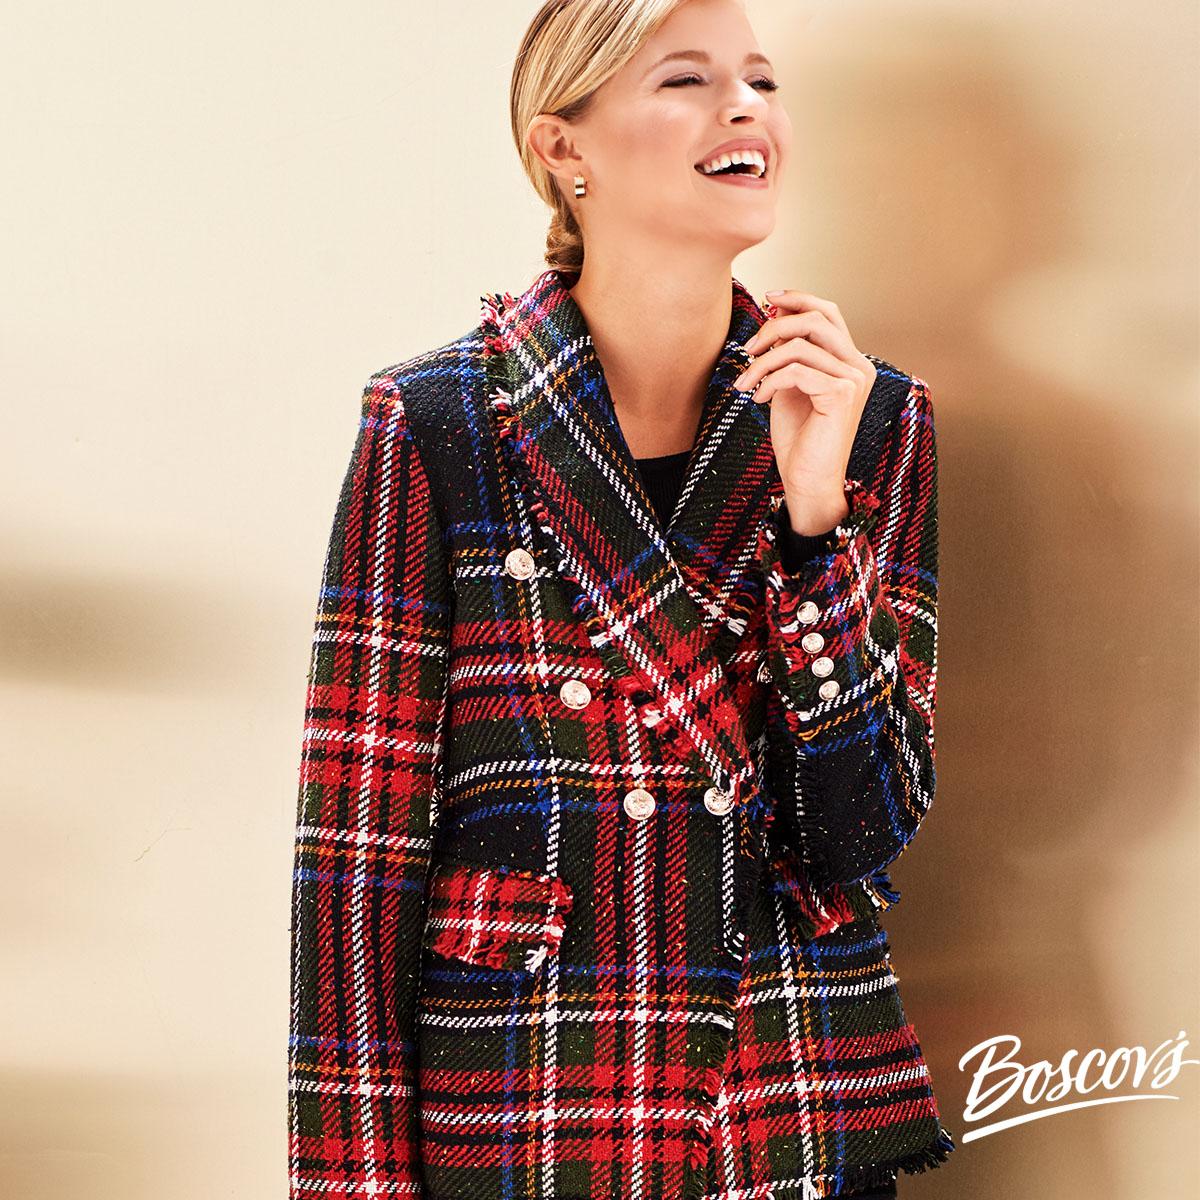 Boscov's Fall plaid outerwear